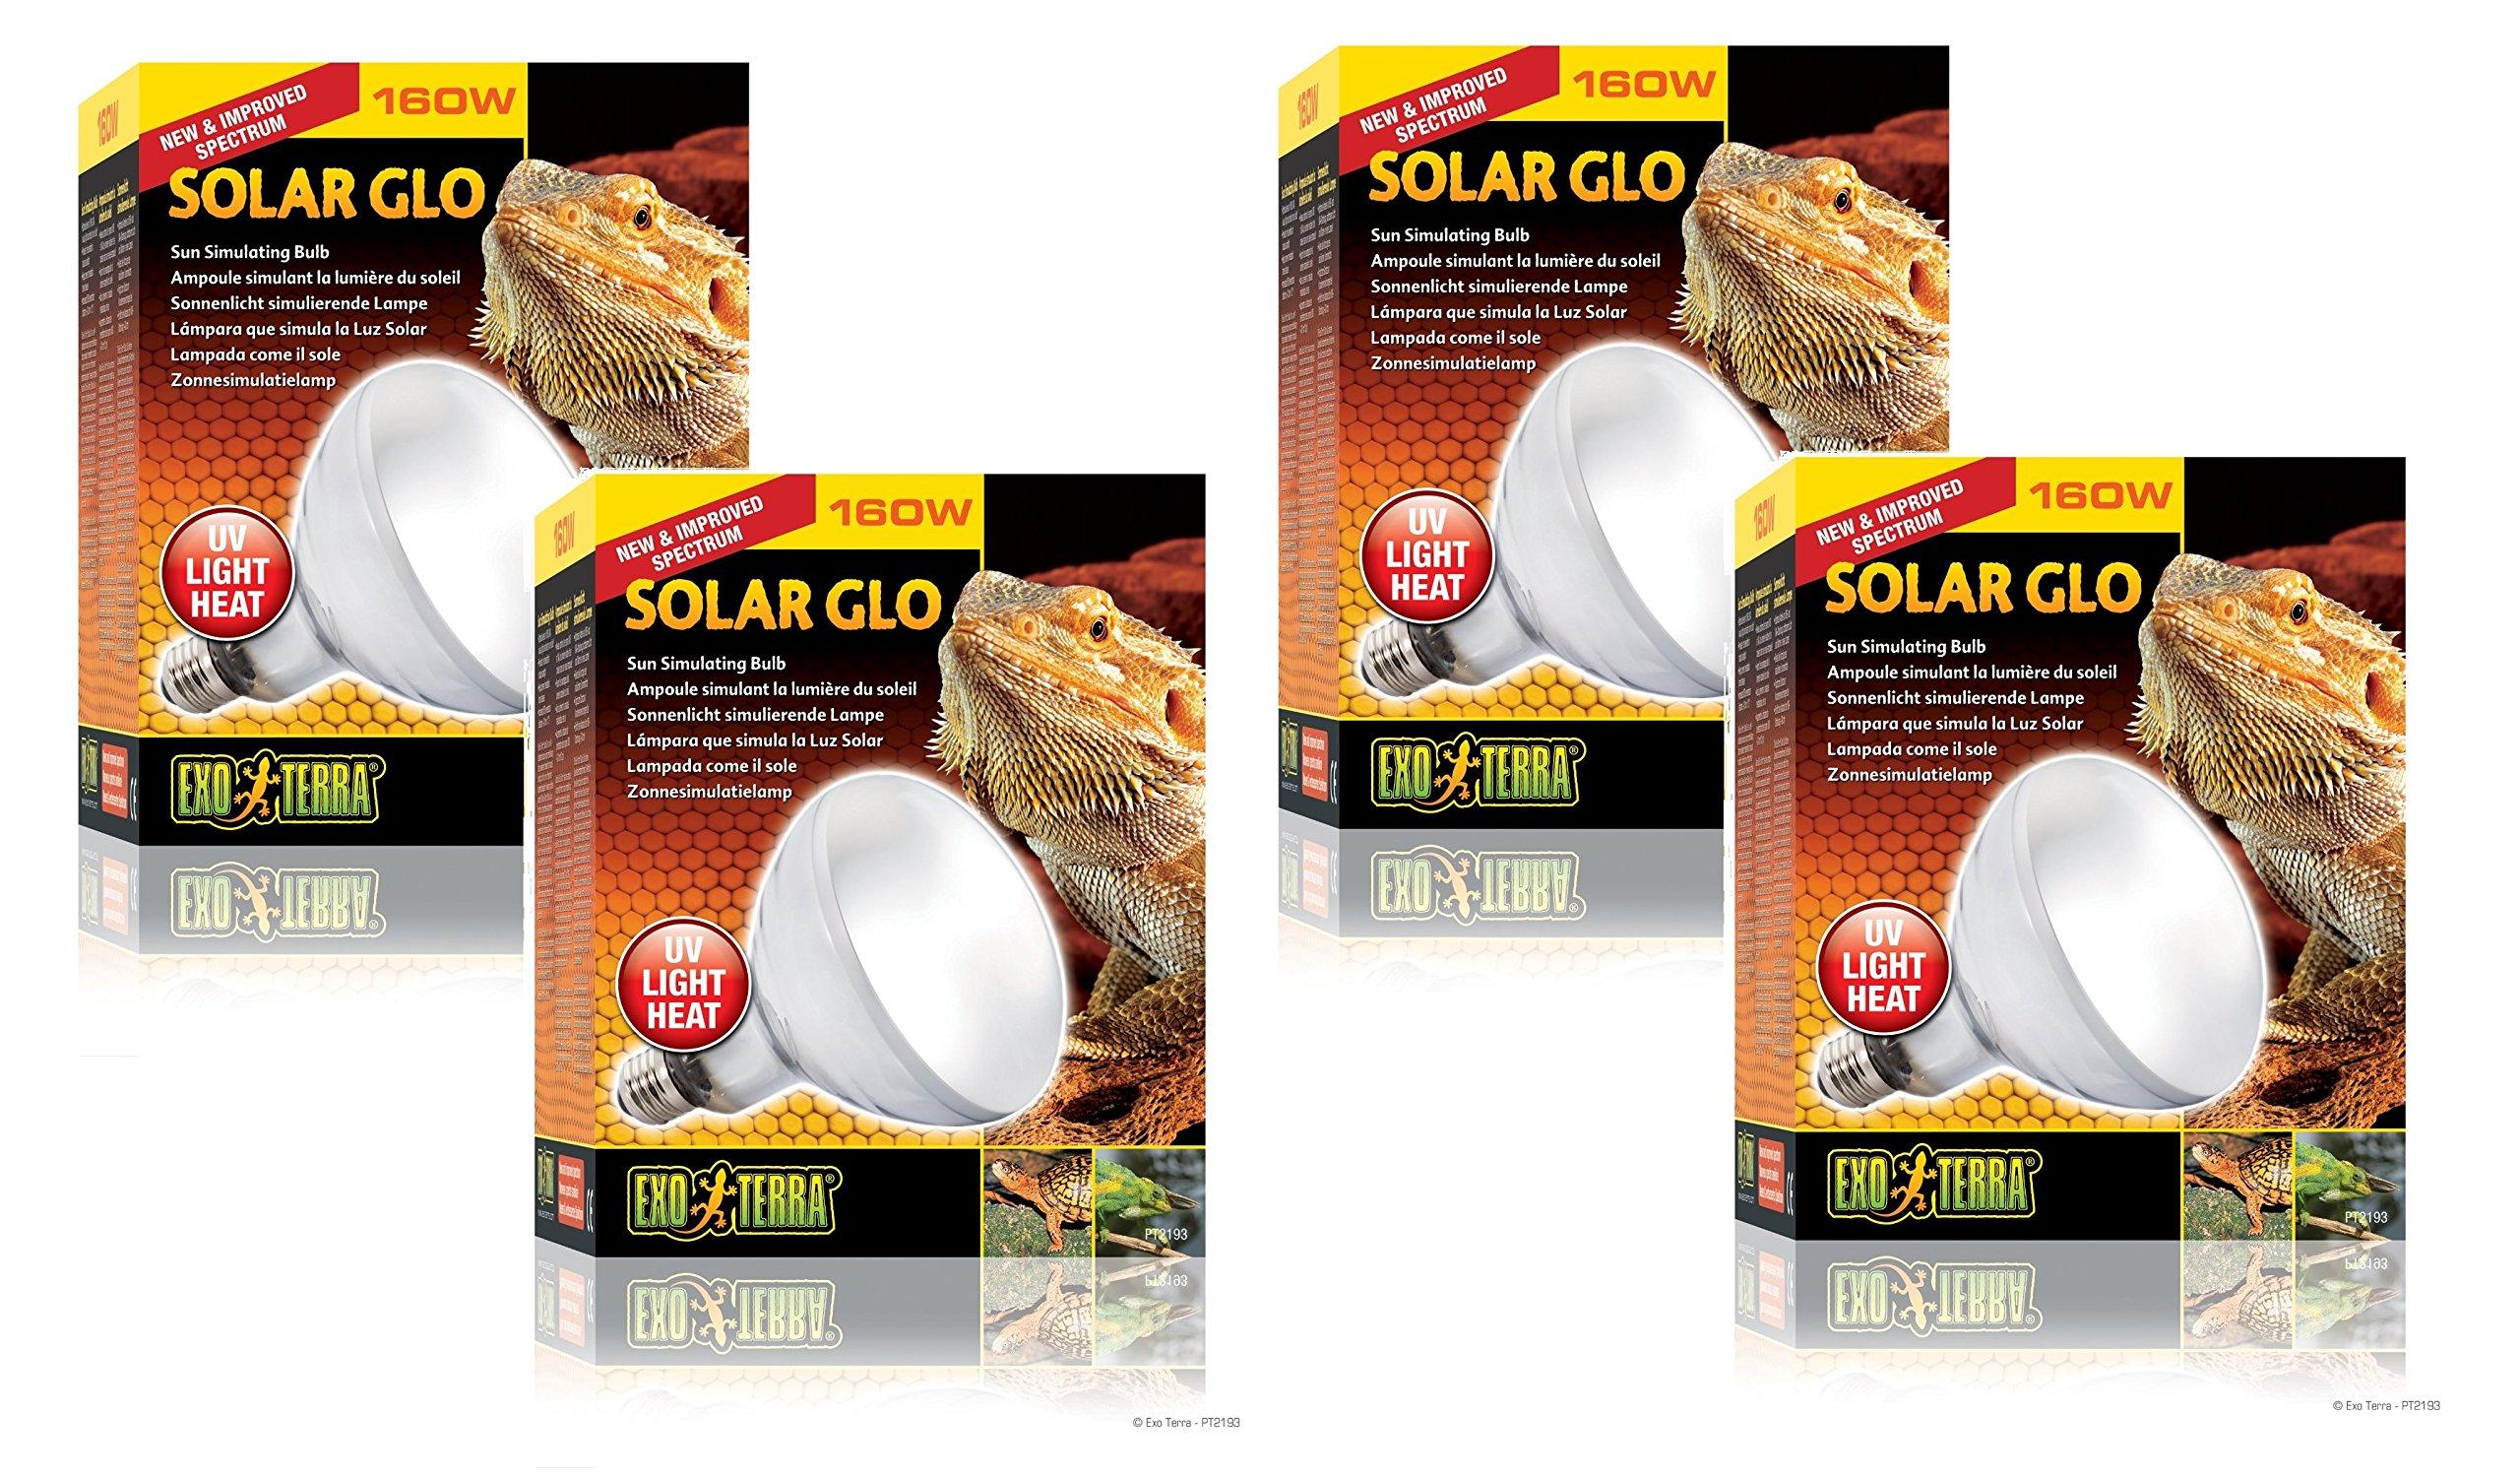 (4 Pack) Exo Terra Solar-Glo High Intensity Self-Ballasted Uv/Heat Mercury Vapor Lamp, 160 Watt